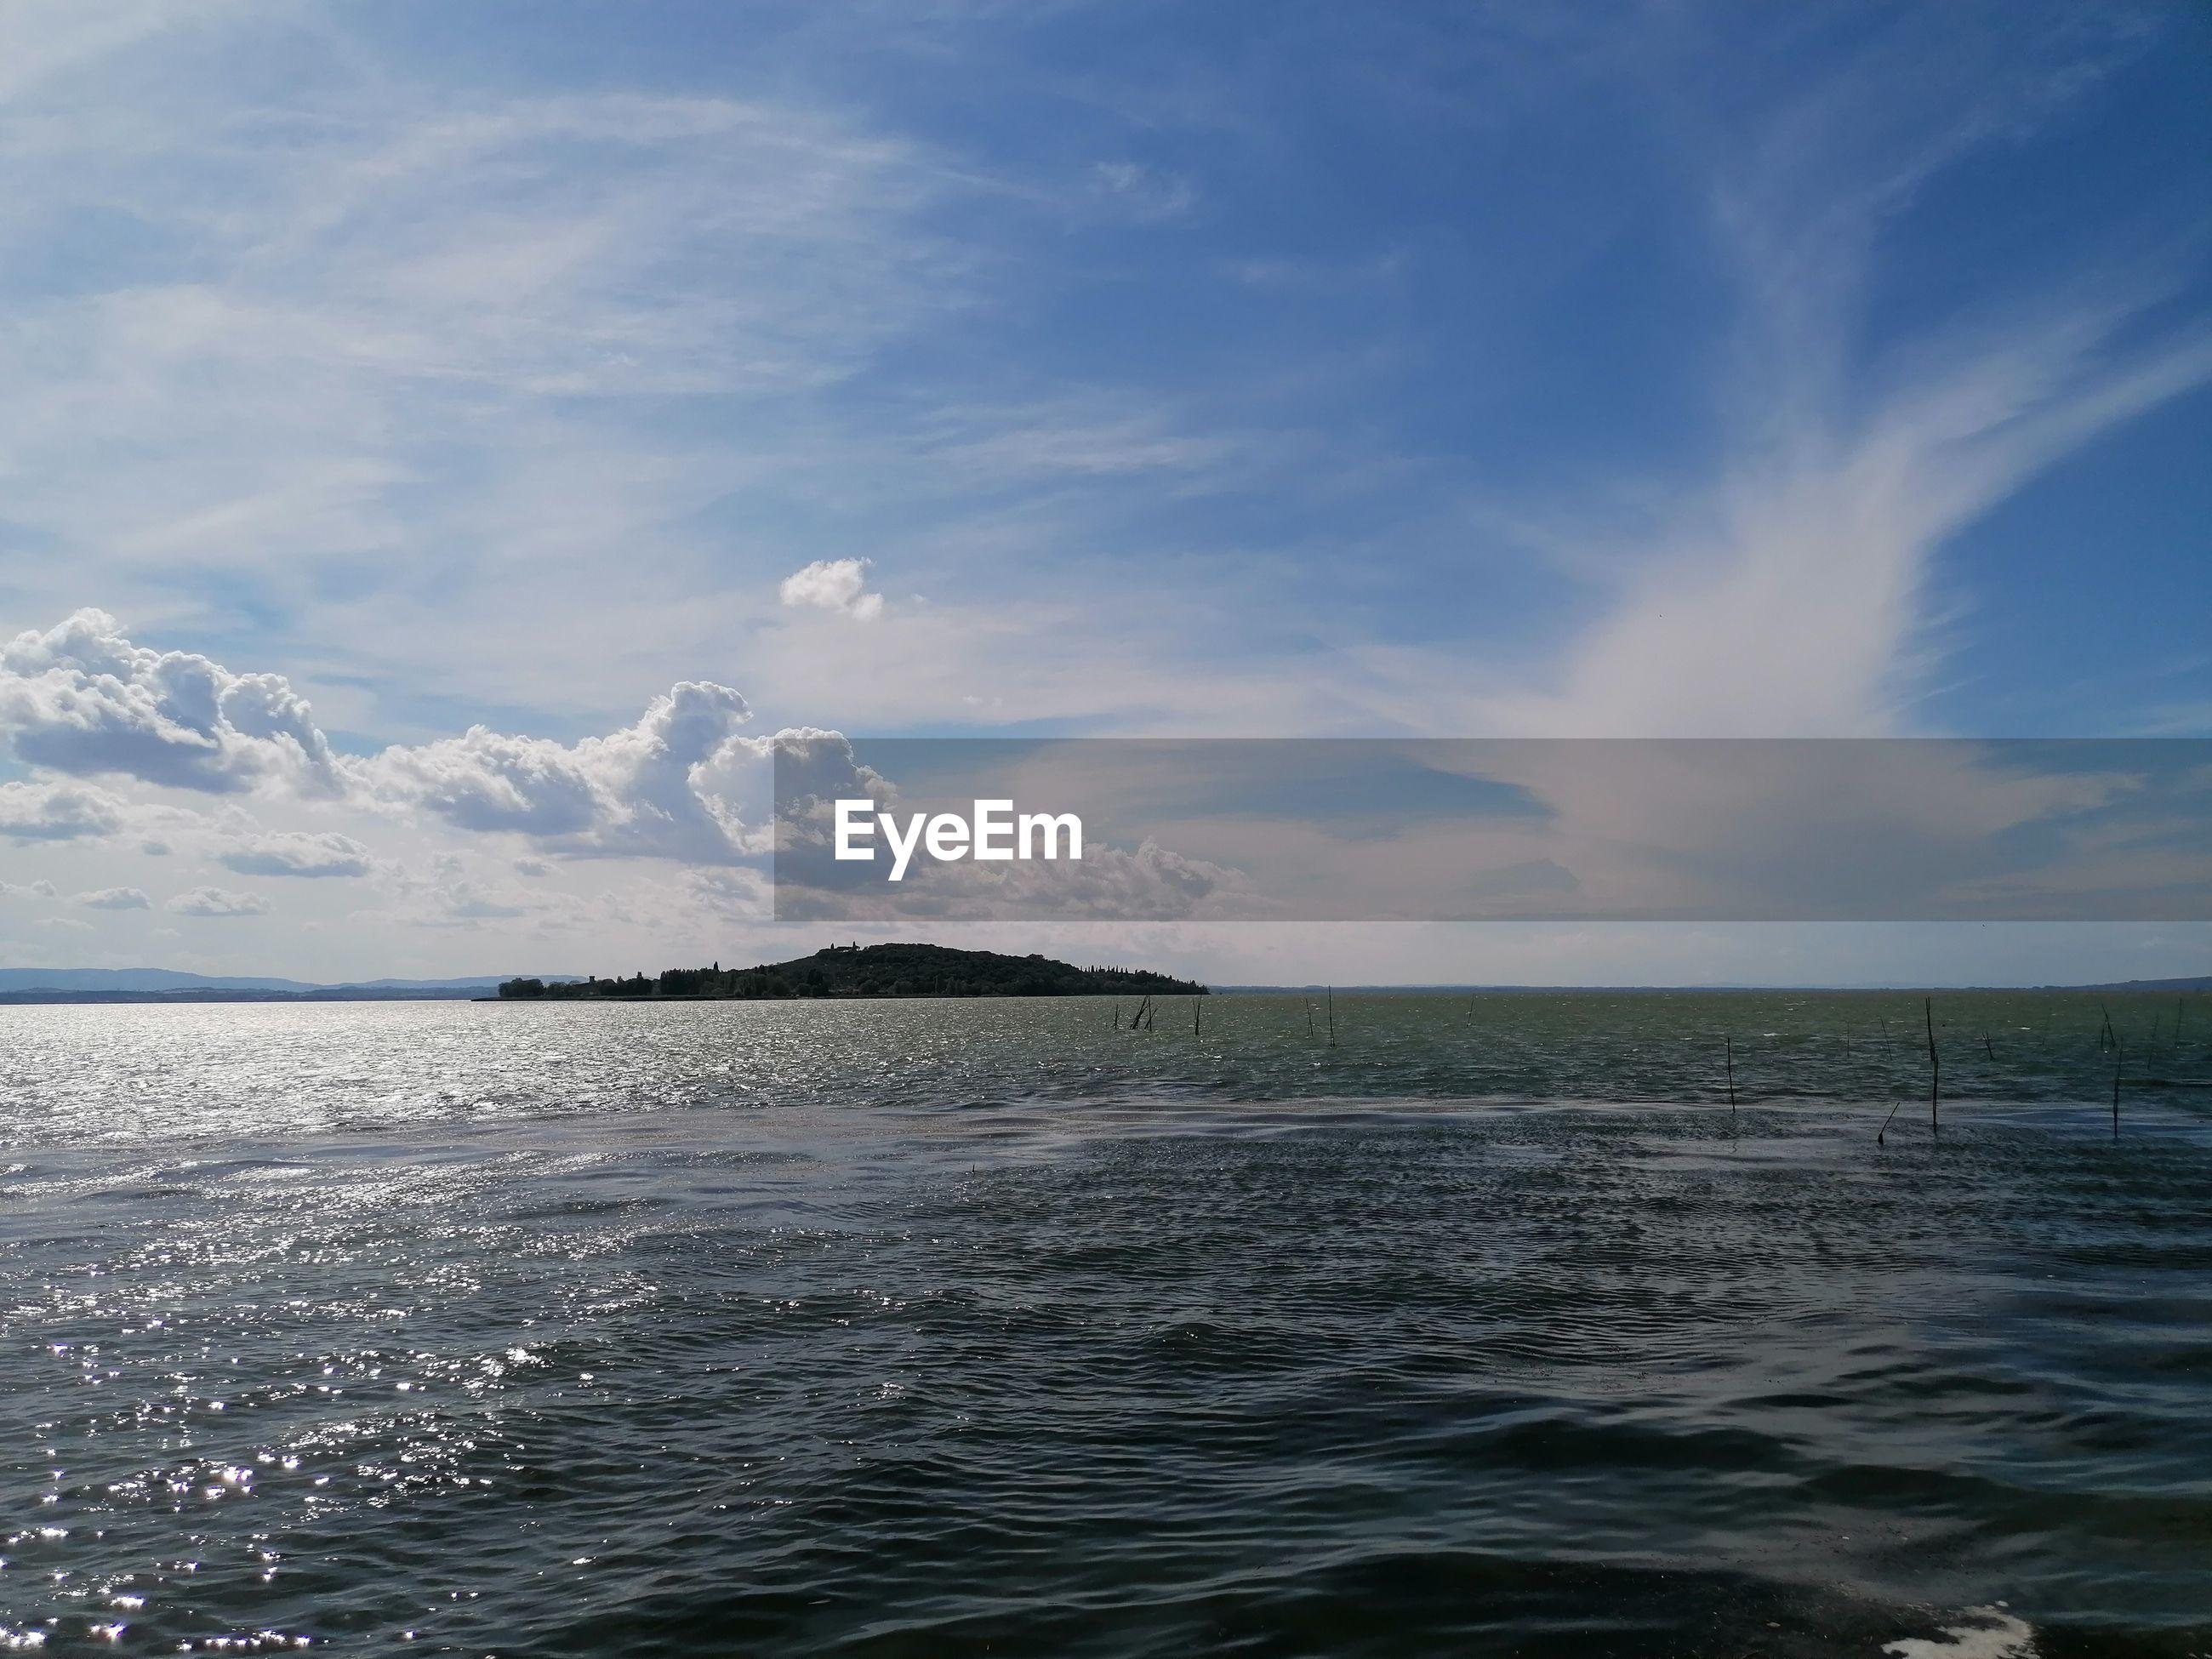 IDYLLIC SHOT OF SEA AGAINST SKY